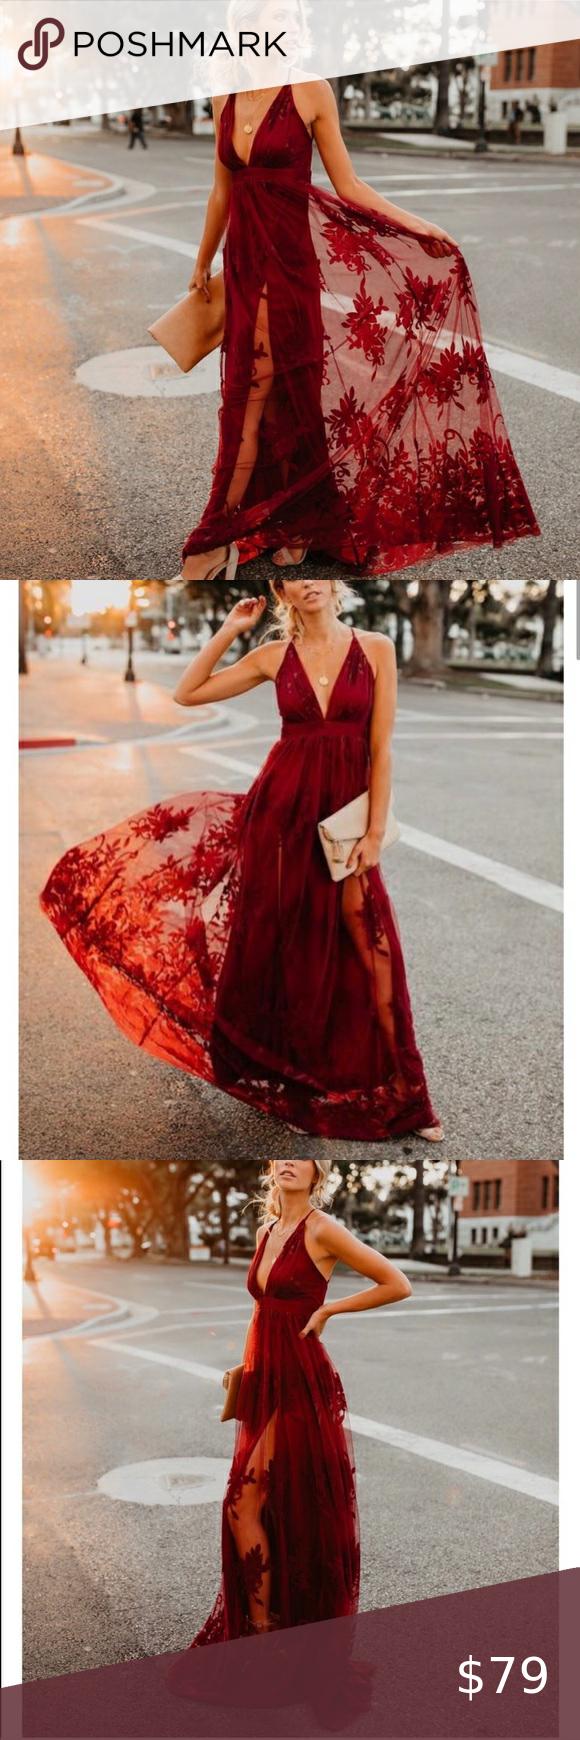 2nd Restock 5 Vici Lace Backless Maxi Dress Backless Maxi Dresses Boutique Maxi Dresses Lace Maxi Dress [ 1740 x 580 Pixel ]